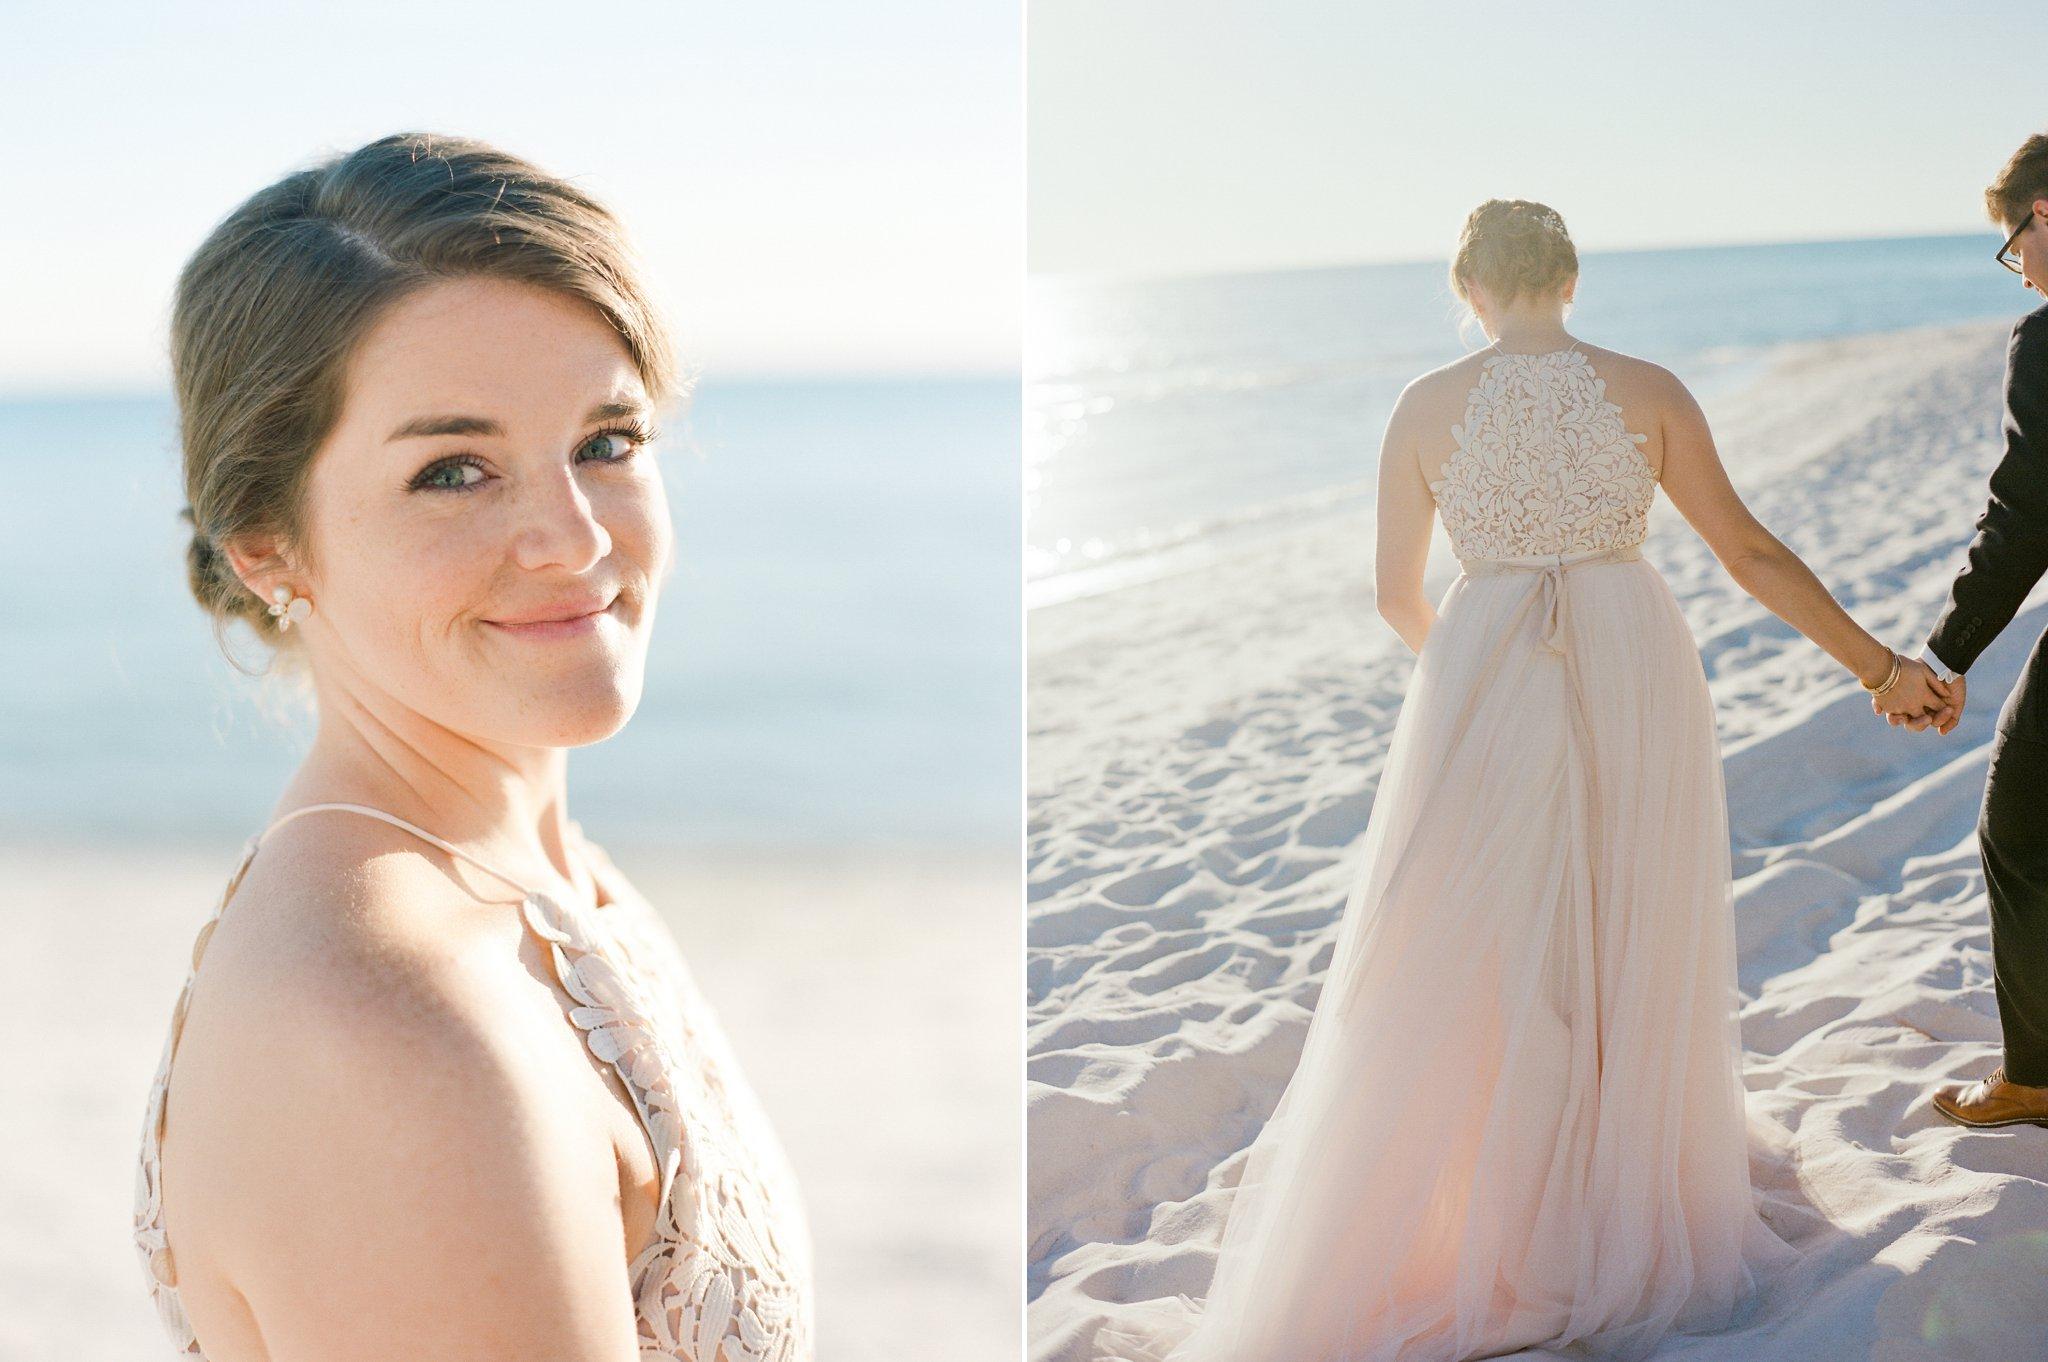 inlet beach wedding 30a wedding inlet beach wedding photographer shannon griffin photography_0041.jpg